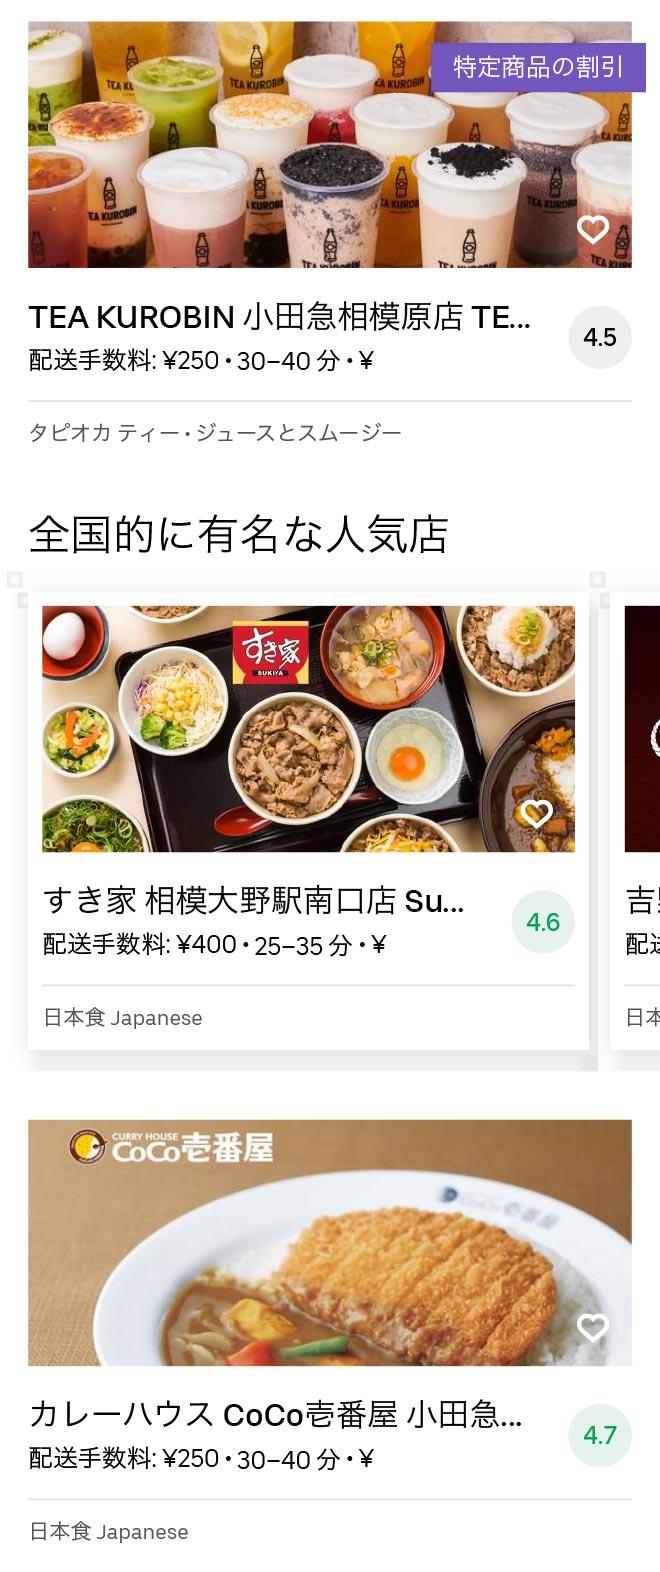 Chuo rinkan menu 2008 02